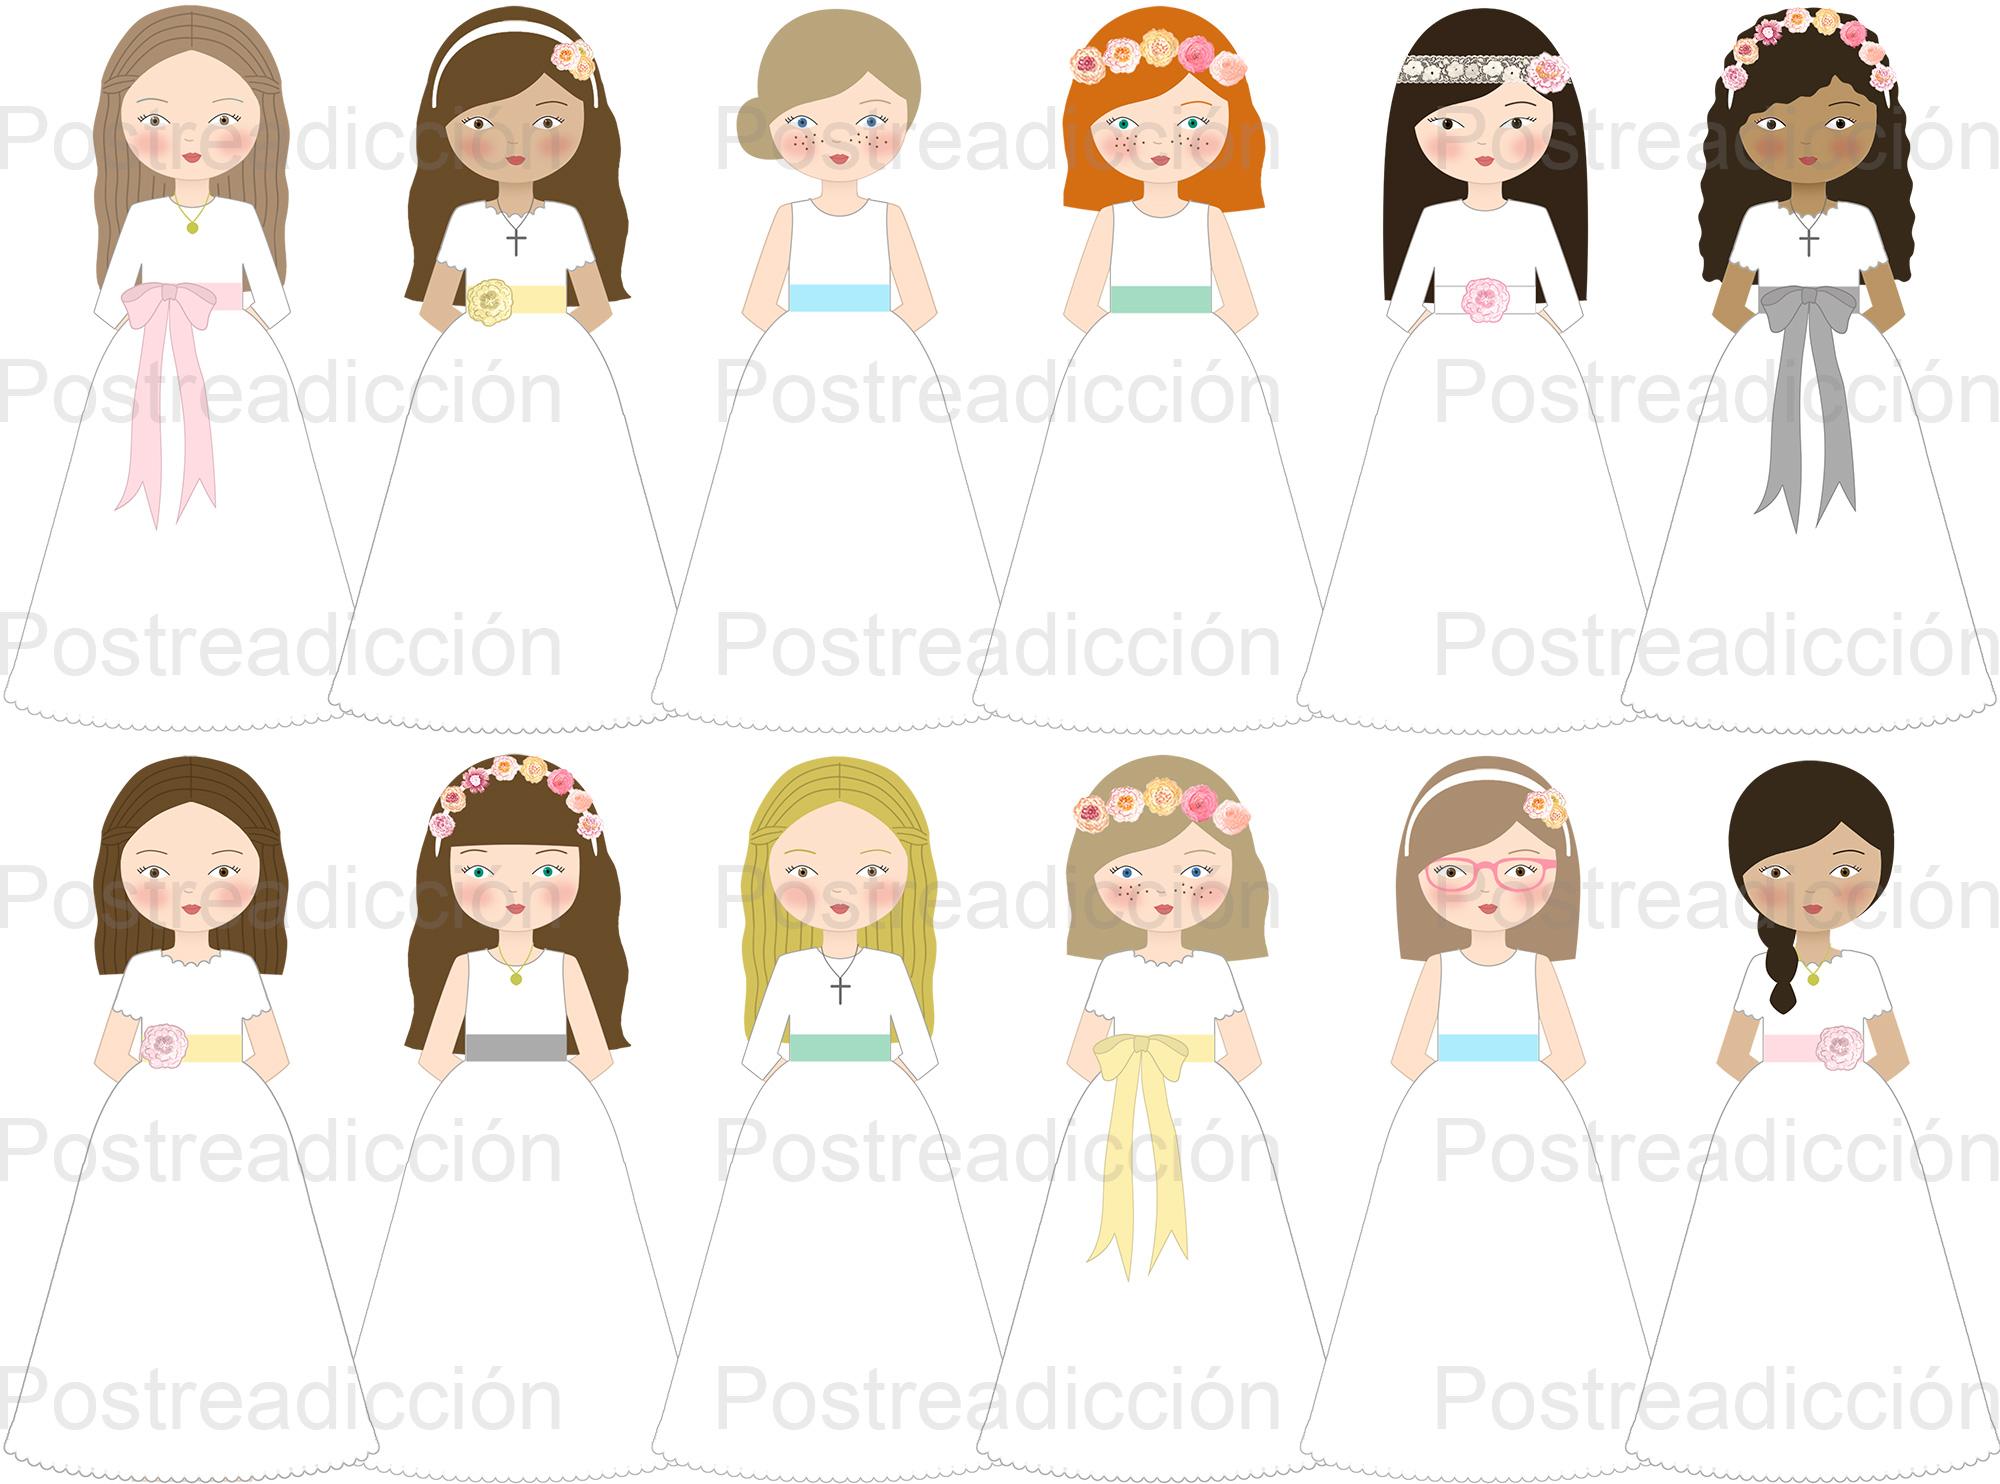 Imagen de producto: https://tienda.postreadiccion.com/img/articulos/secundarias13574-modelo-no-1781-nina-de-comunion-carlota-1.jpg